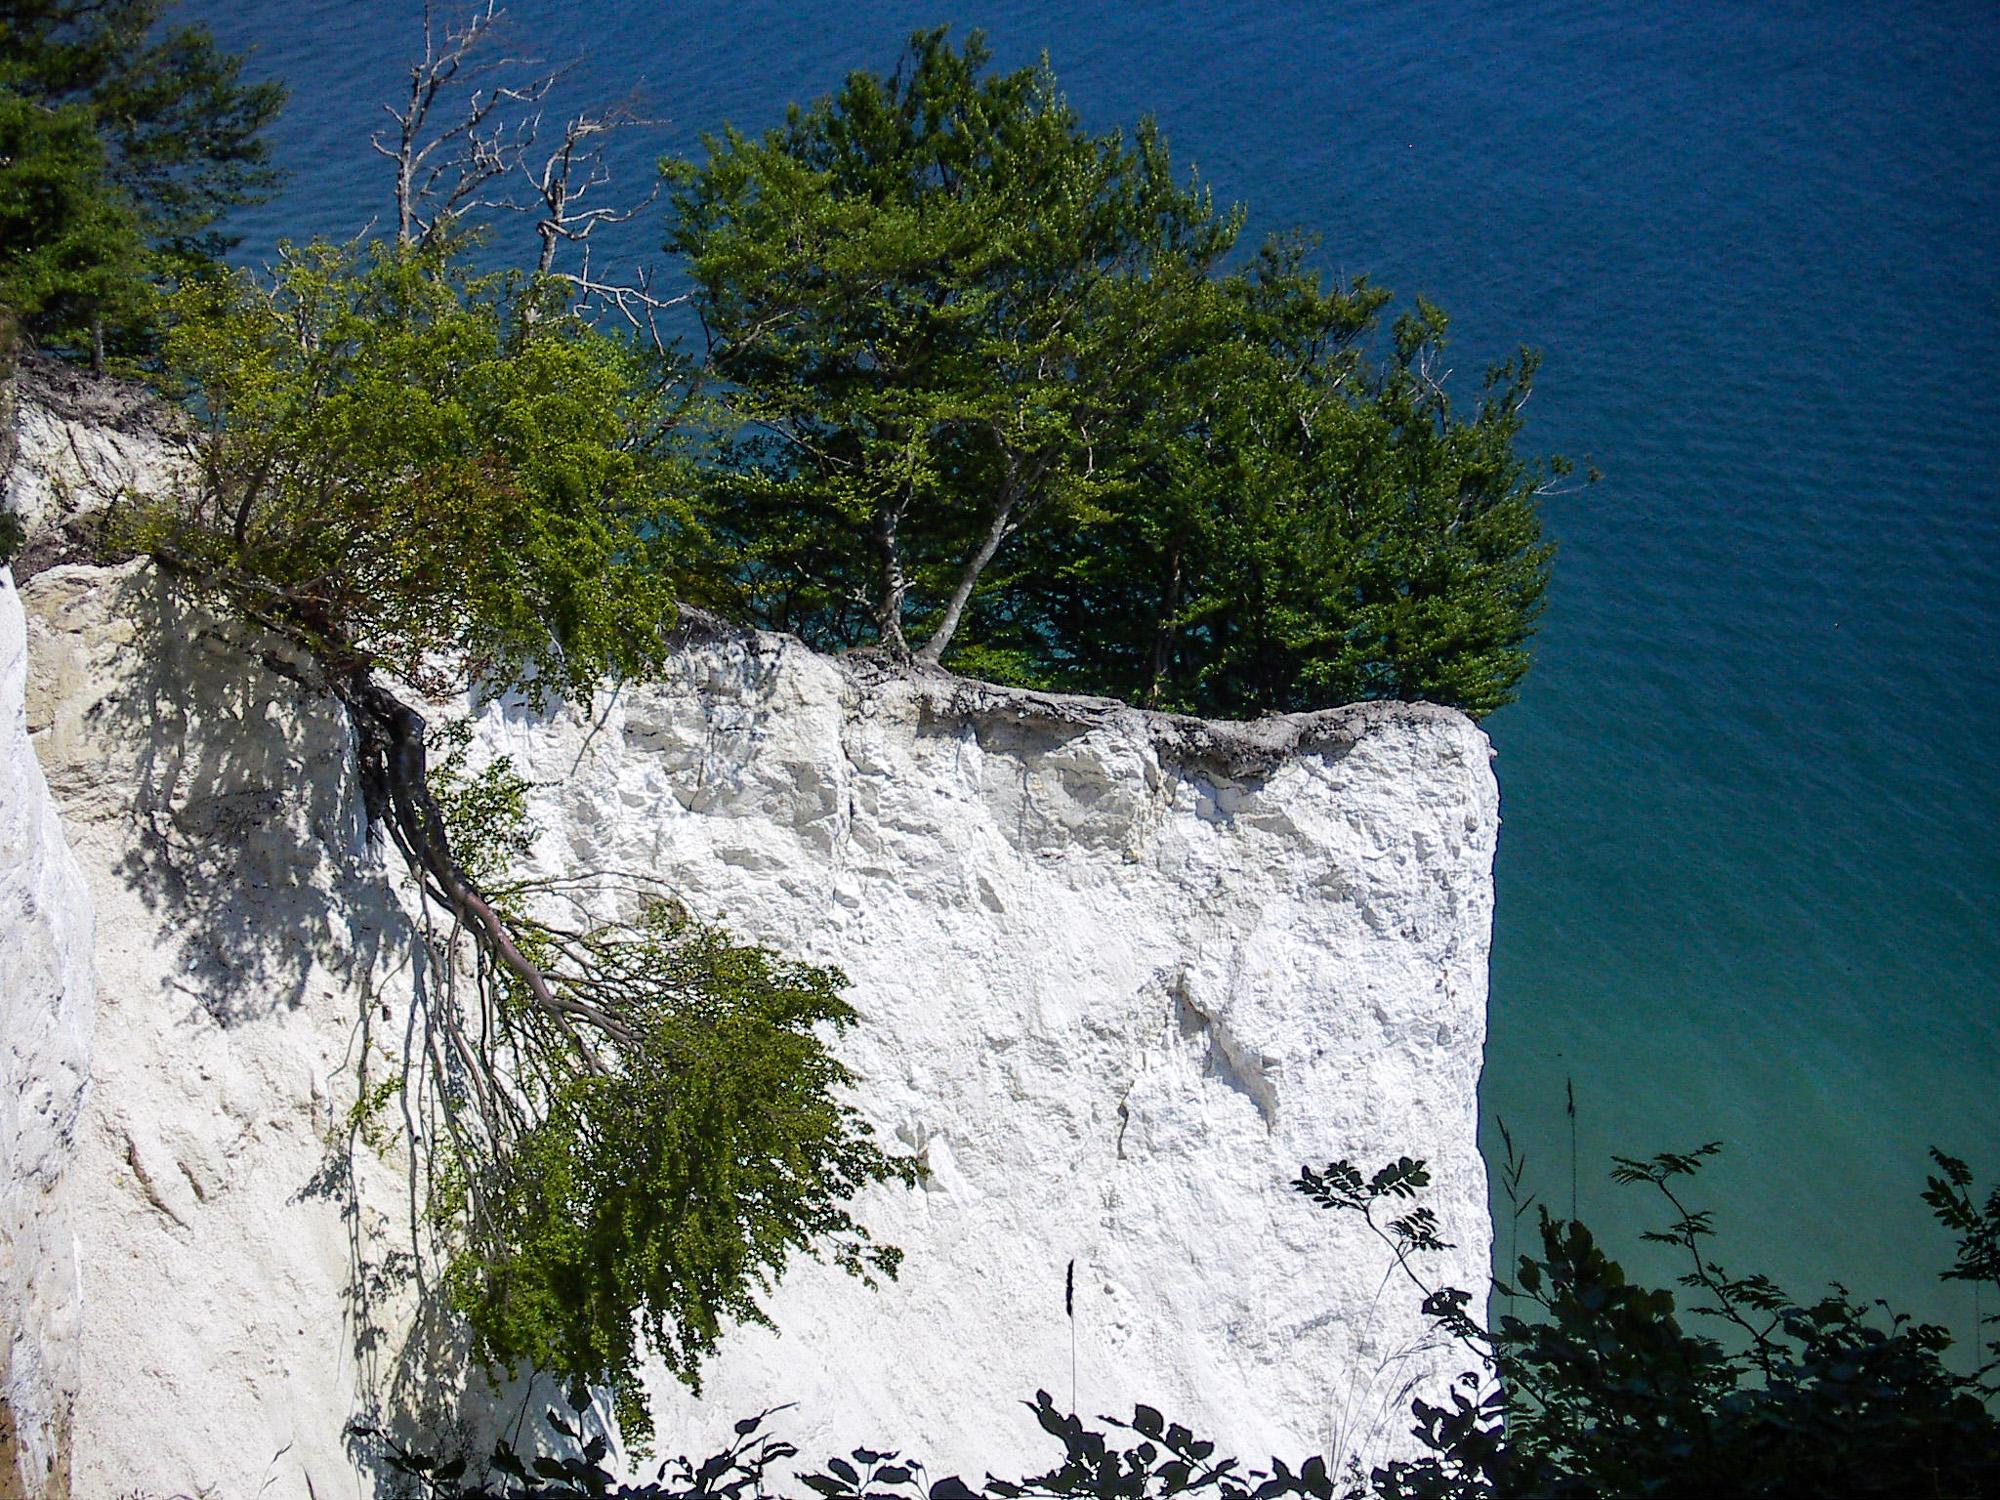 möns klint danmark